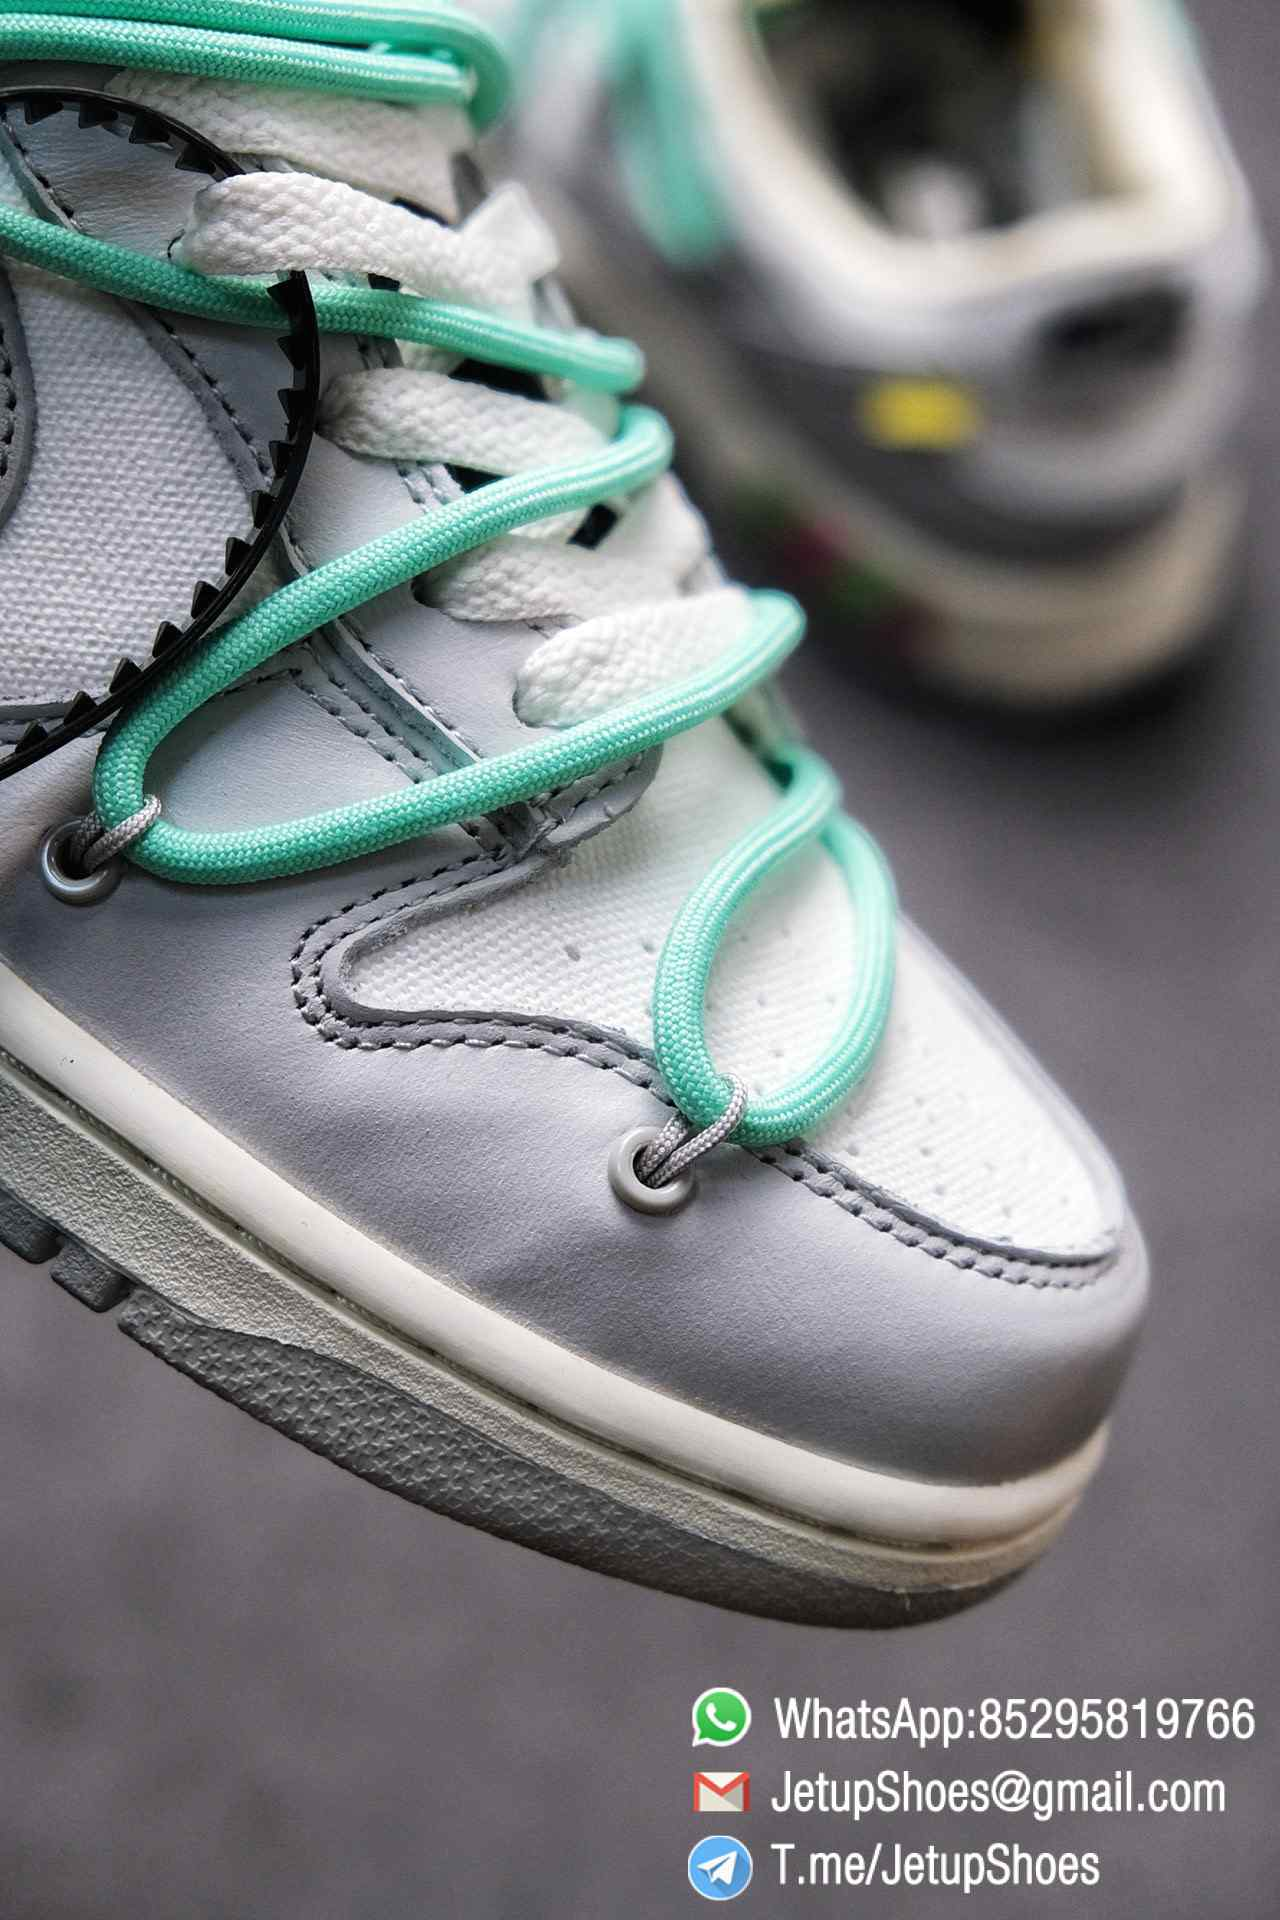 Best Replica Nike Sneakers 0ff White x Nike Dunk Low 04 of 50 SKU DM1602 114 Top RepSneakers Supplier 09